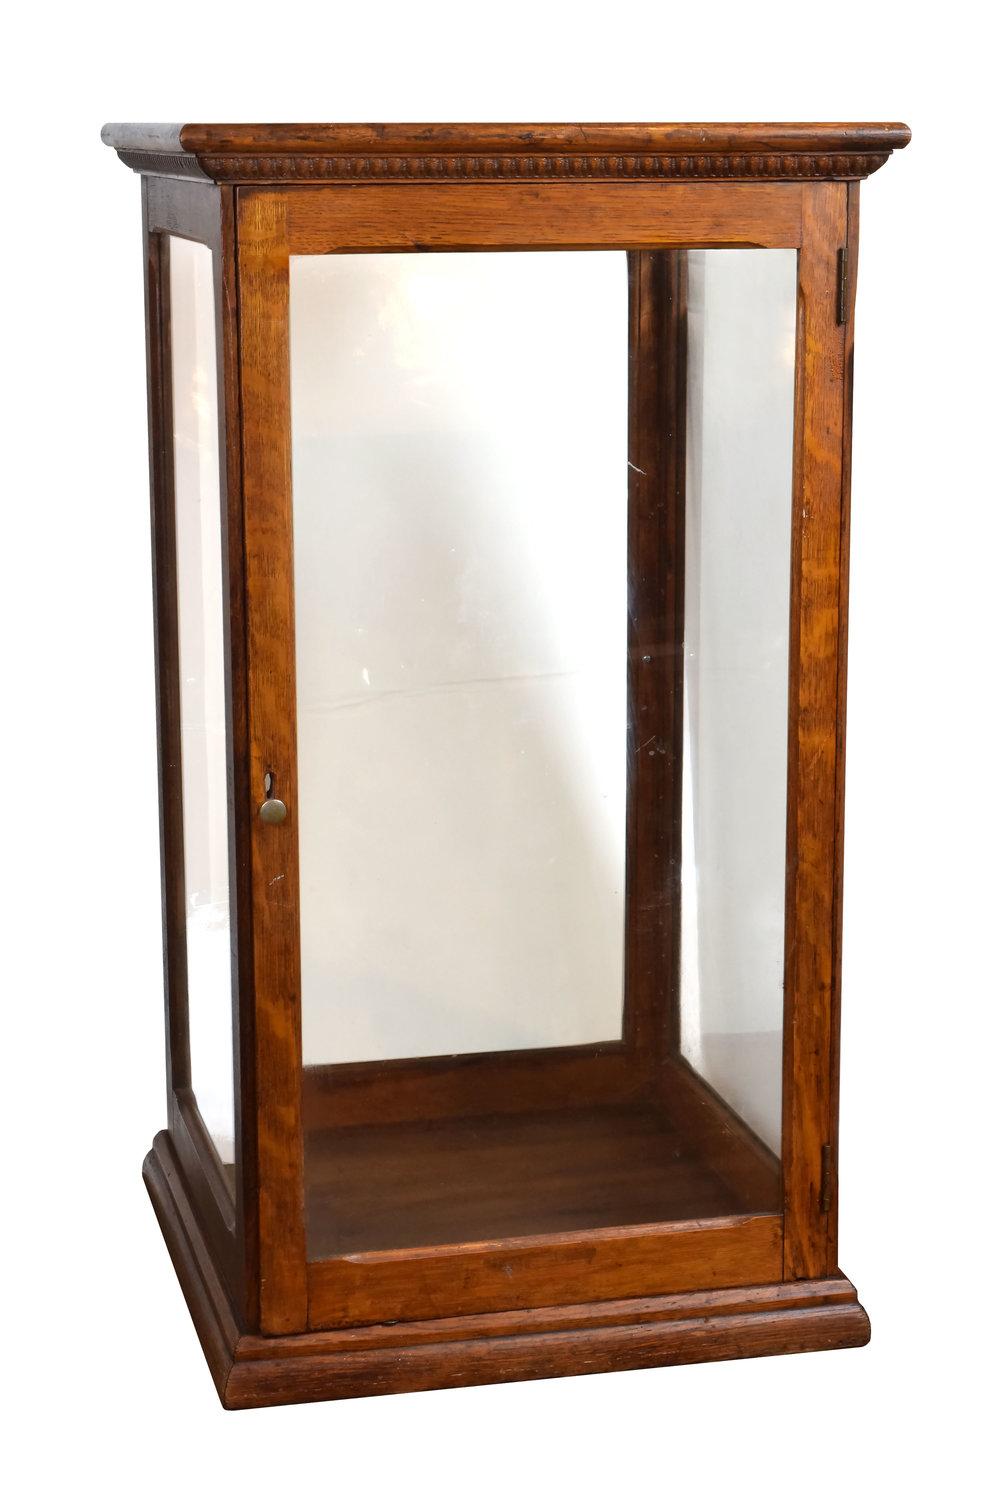 47260-quartersawn-oak-display-case-angle-view.jpg